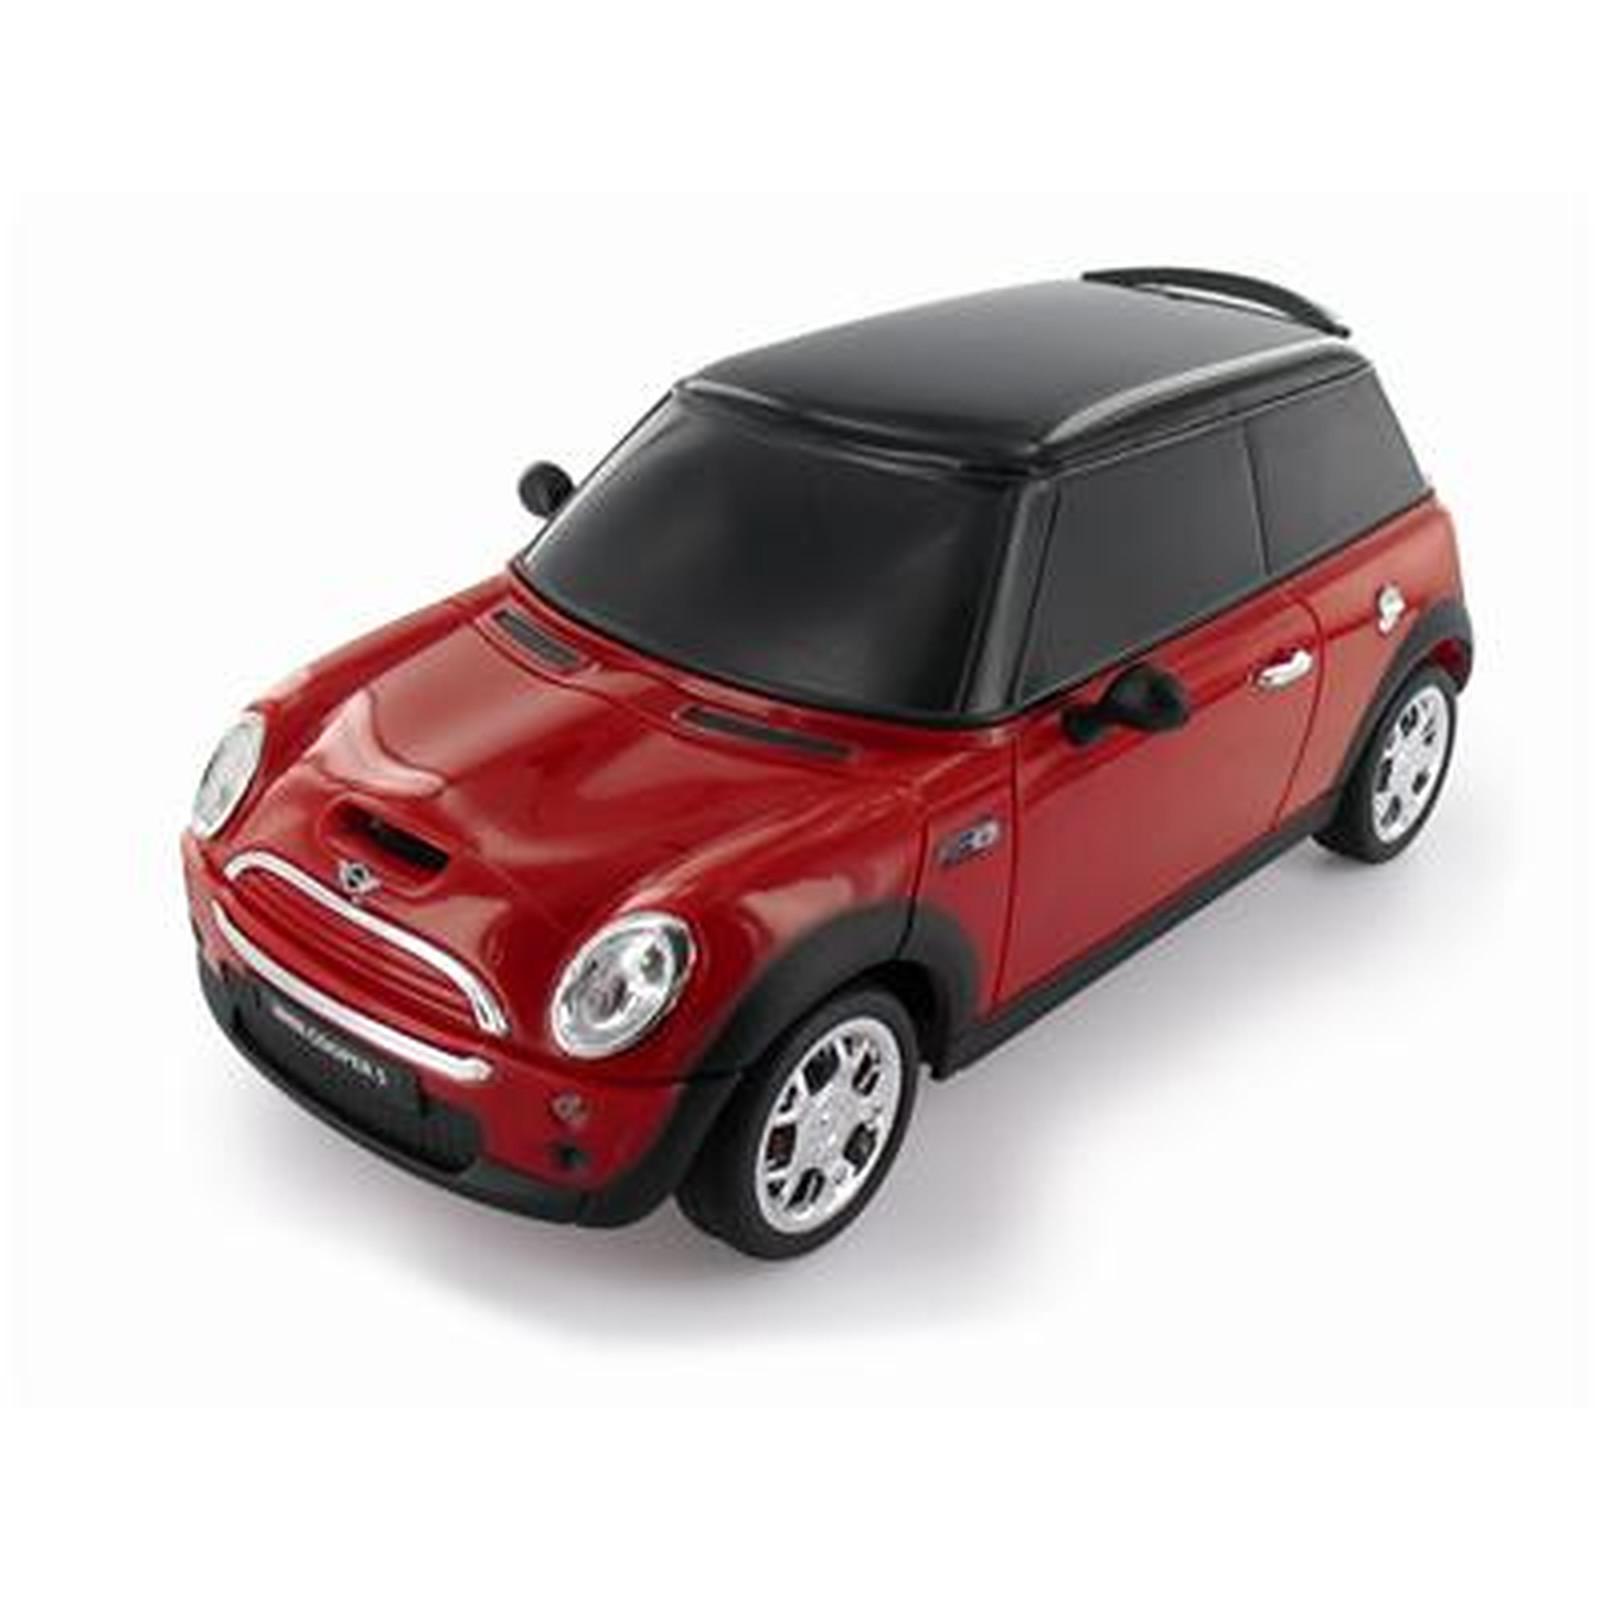 beewi mini cooper rouge accessoires divers smartphone. Black Bedroom Furniture Sets. Home Design Ideas